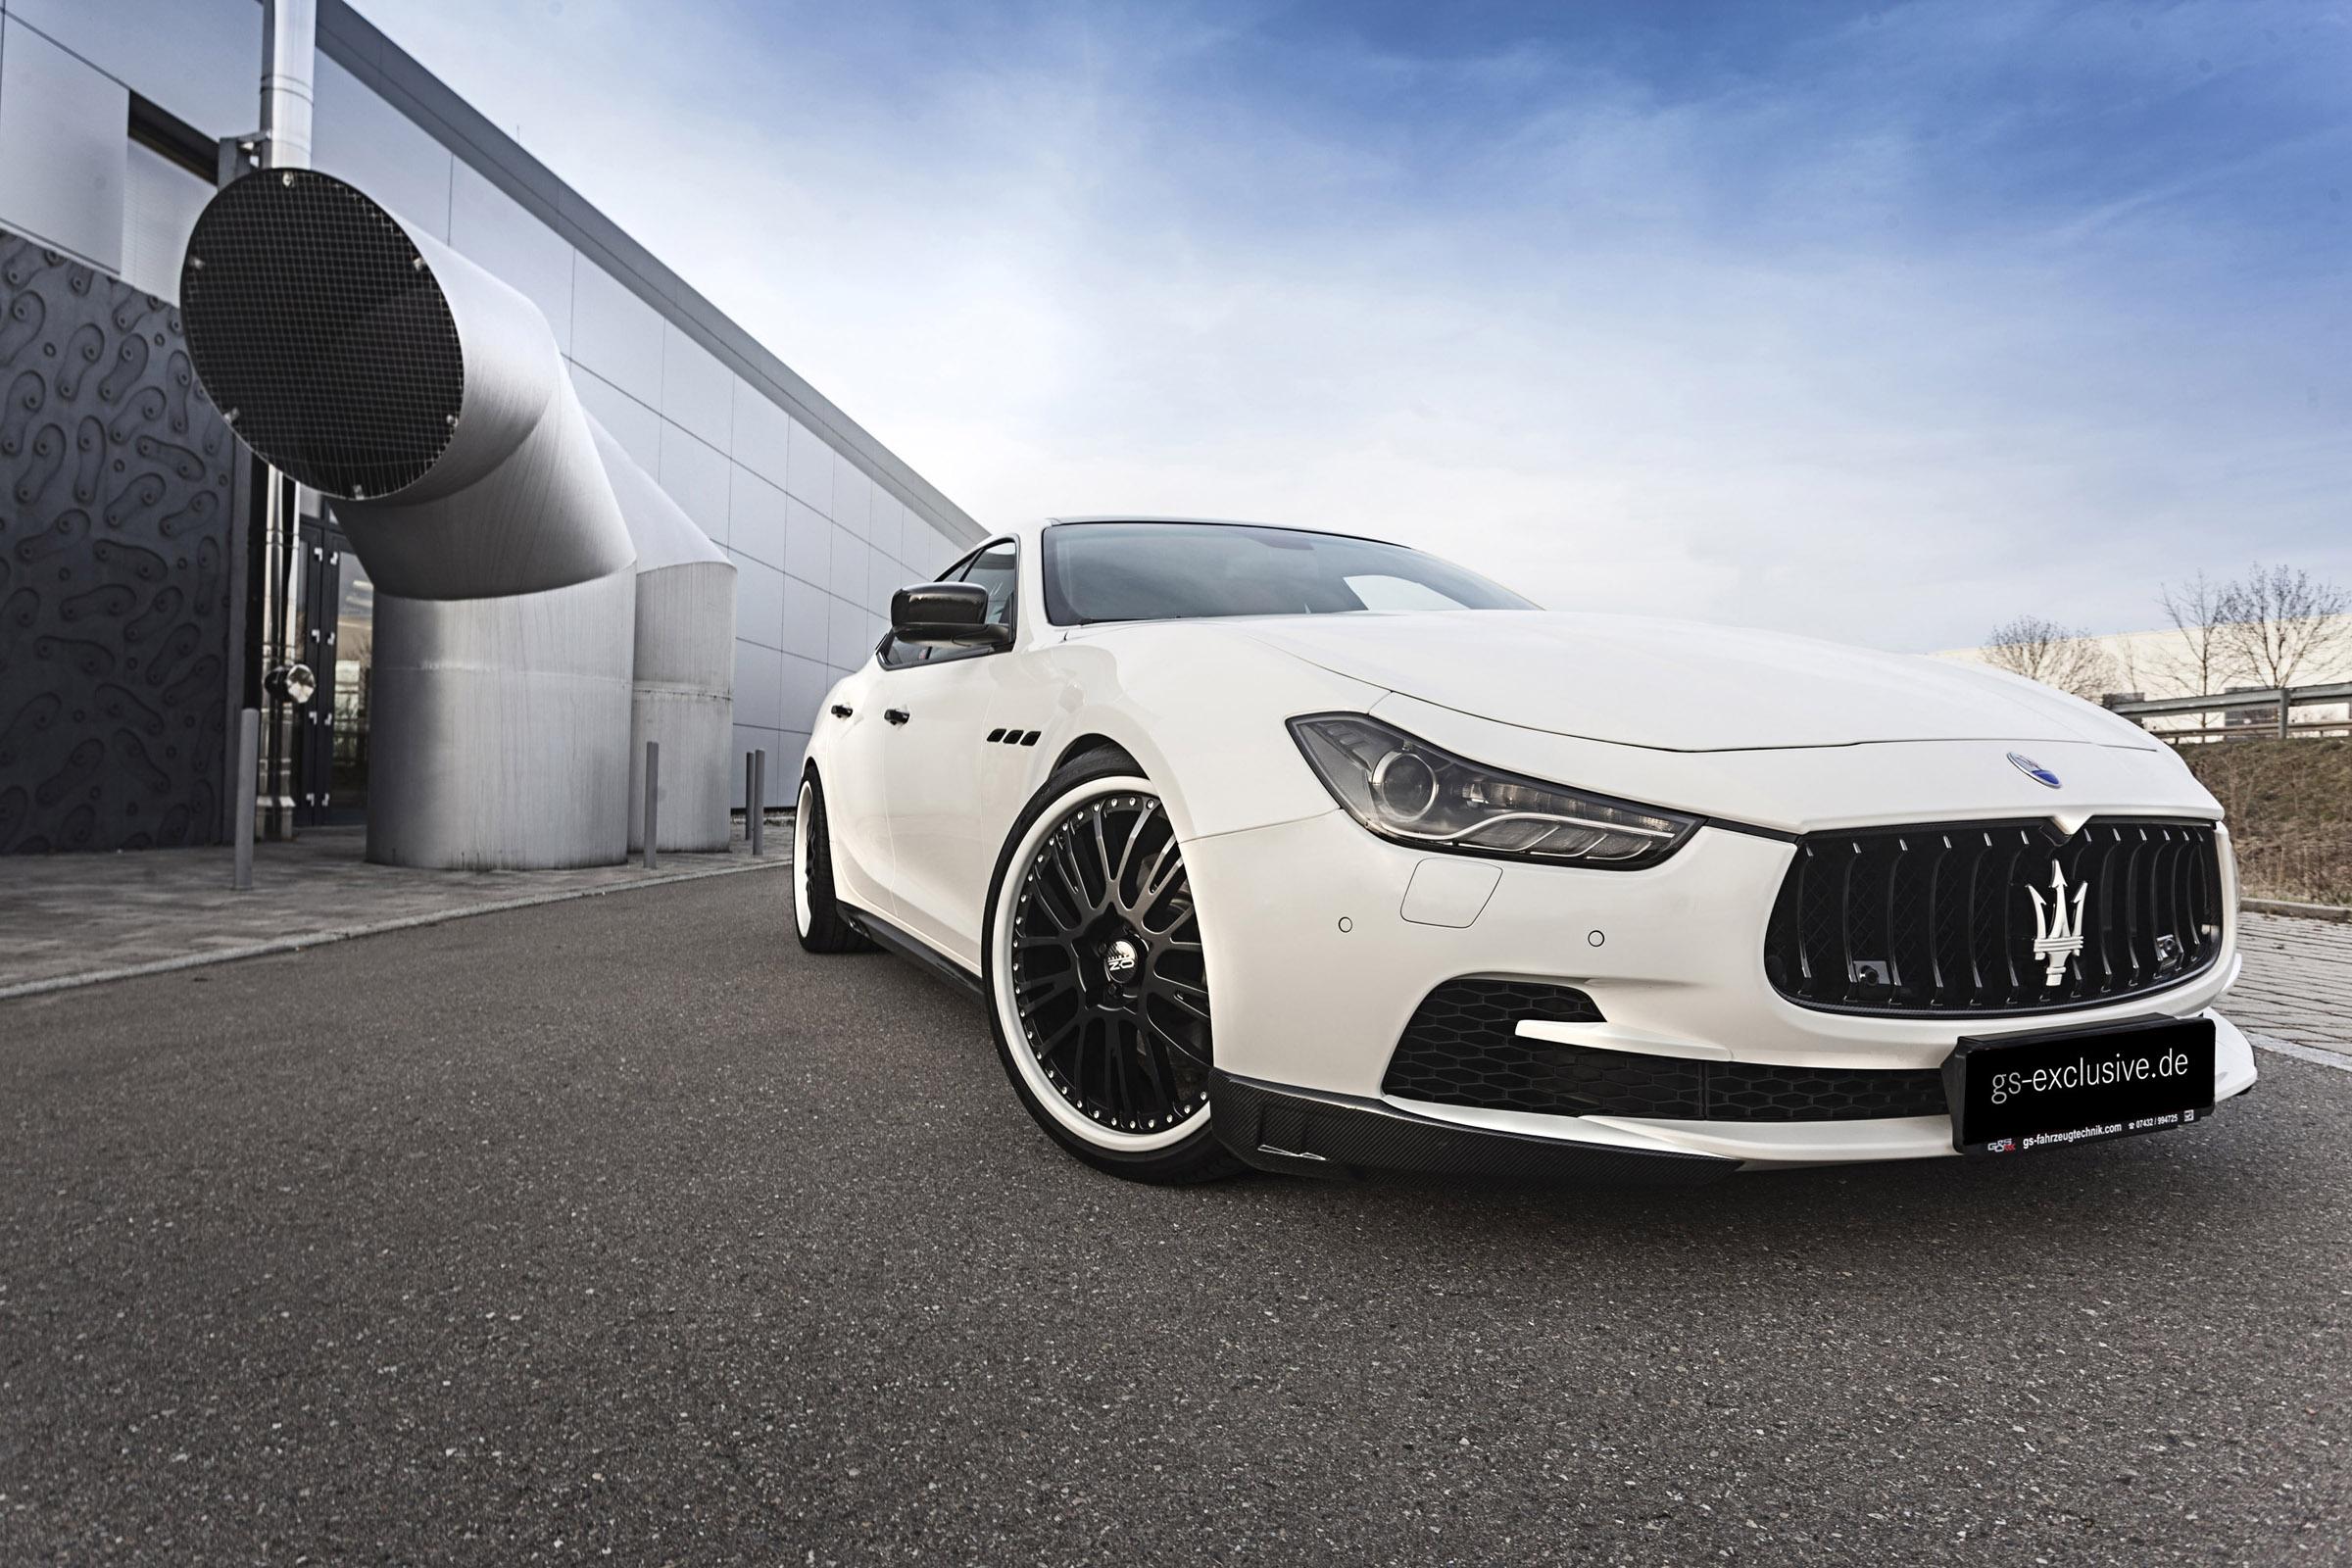 Maserati Ghibli Night Top Car Designs - Show car ultra shine detail spray